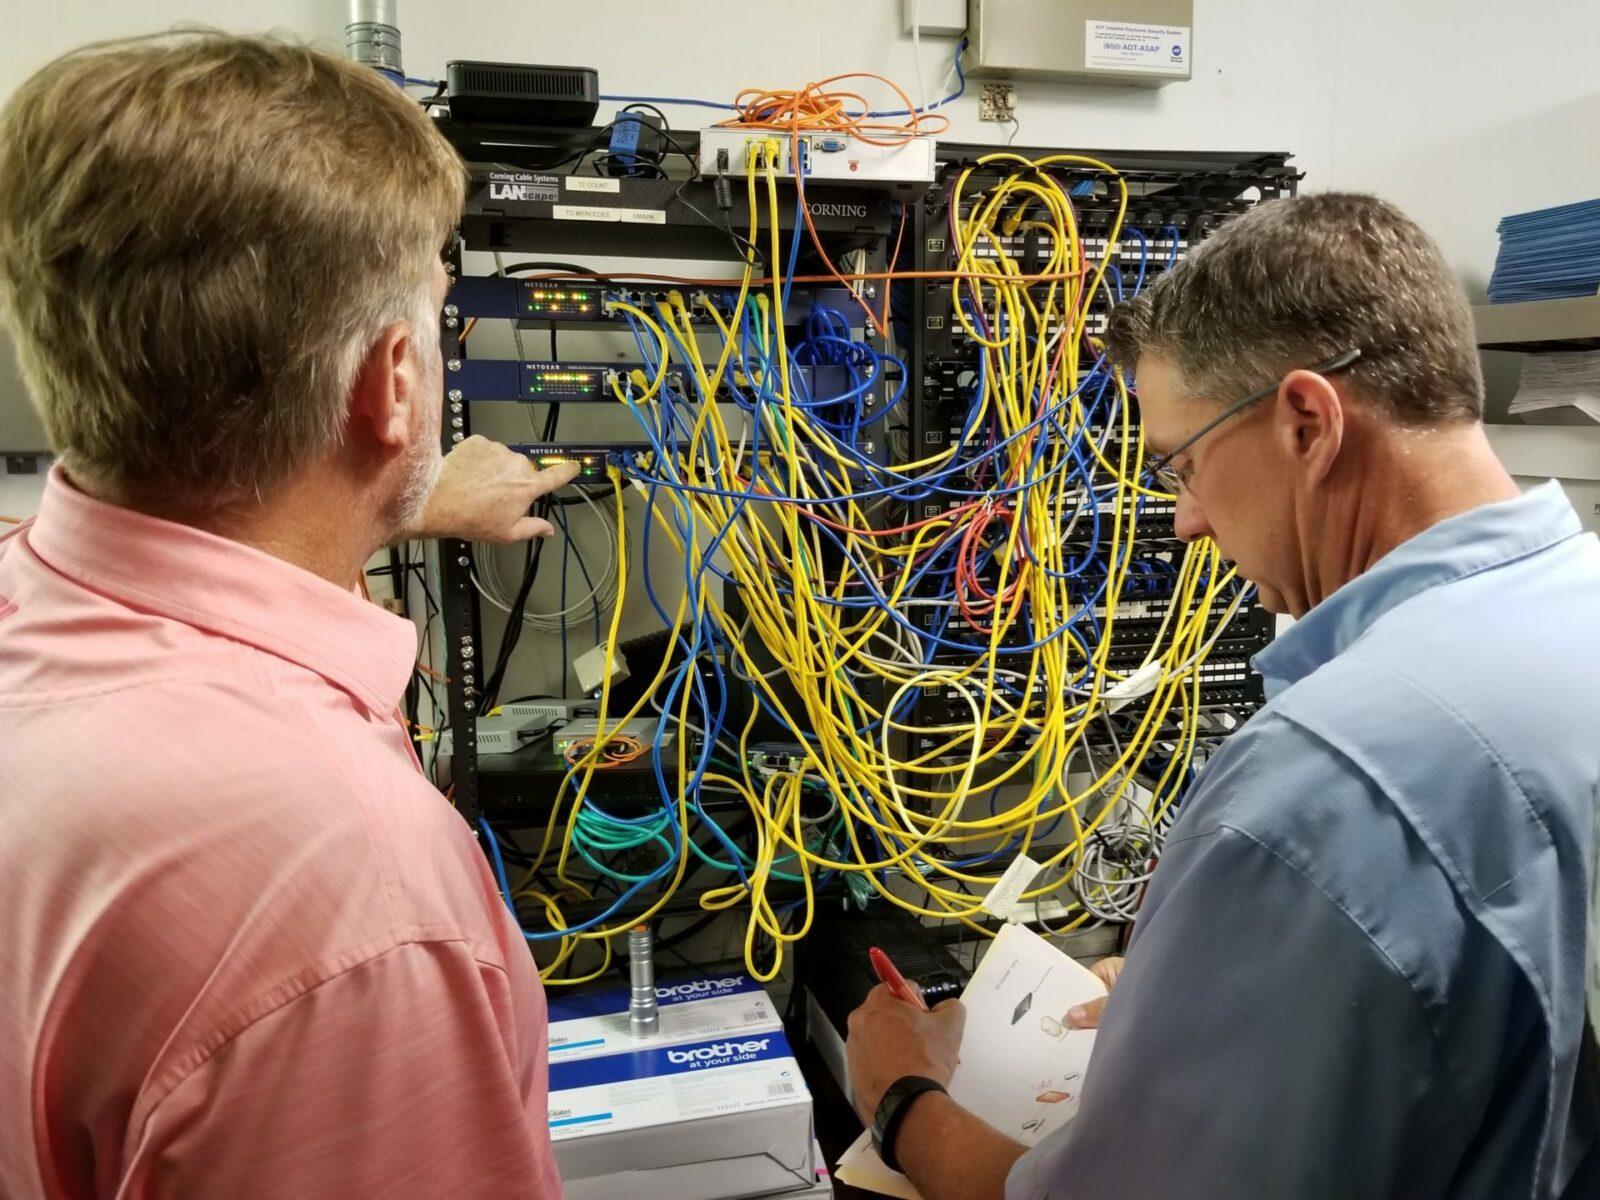 Lakeland IT Company Preparing To Install Fast Fiber Optic Internet